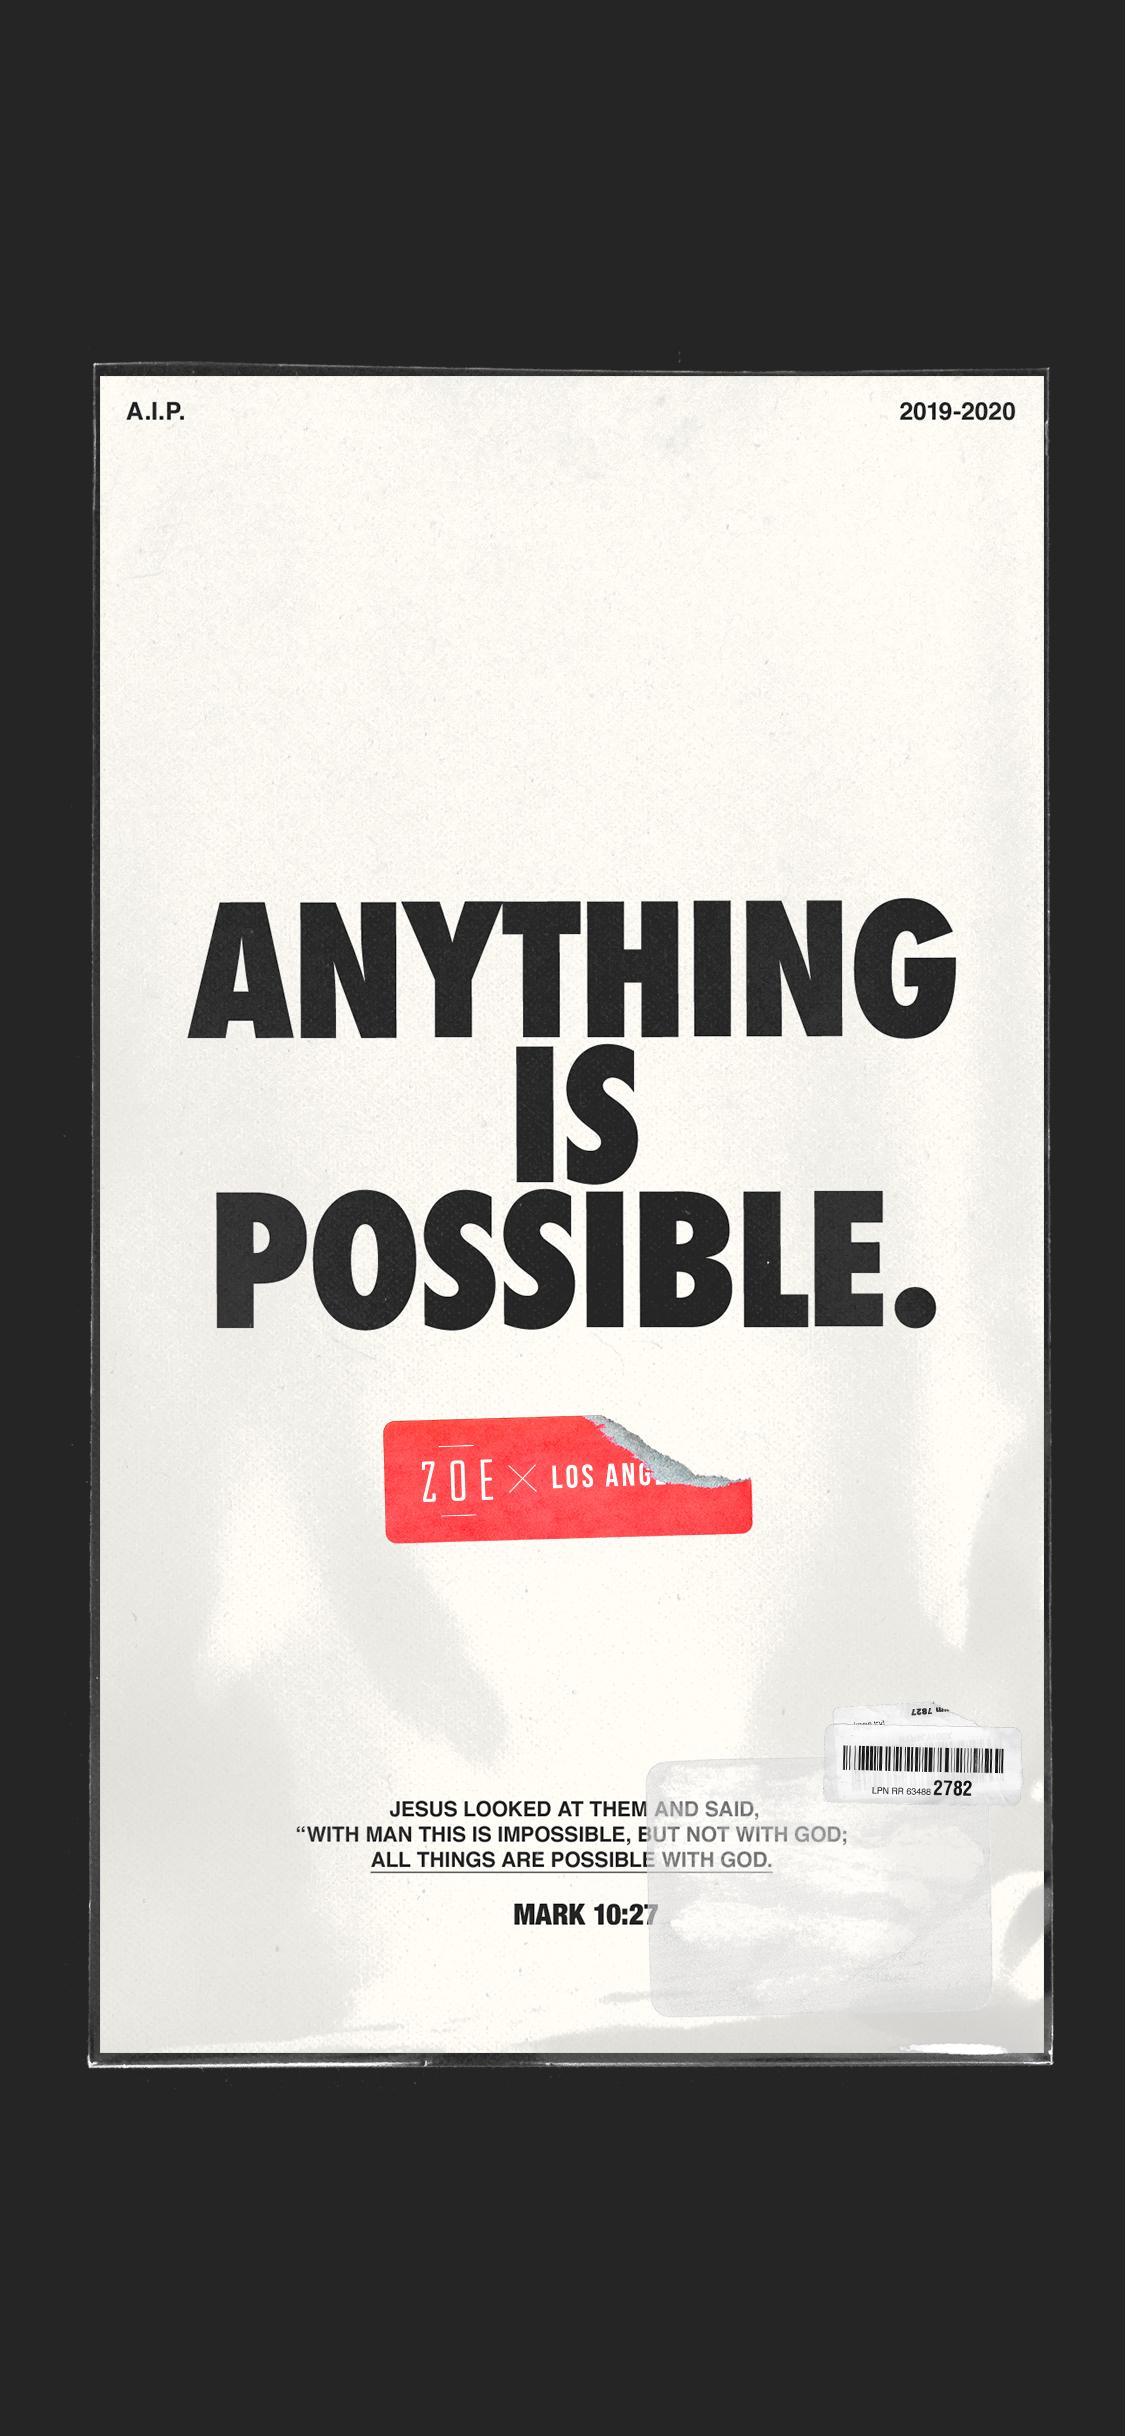 AIP_Wallpaper 2.jpg